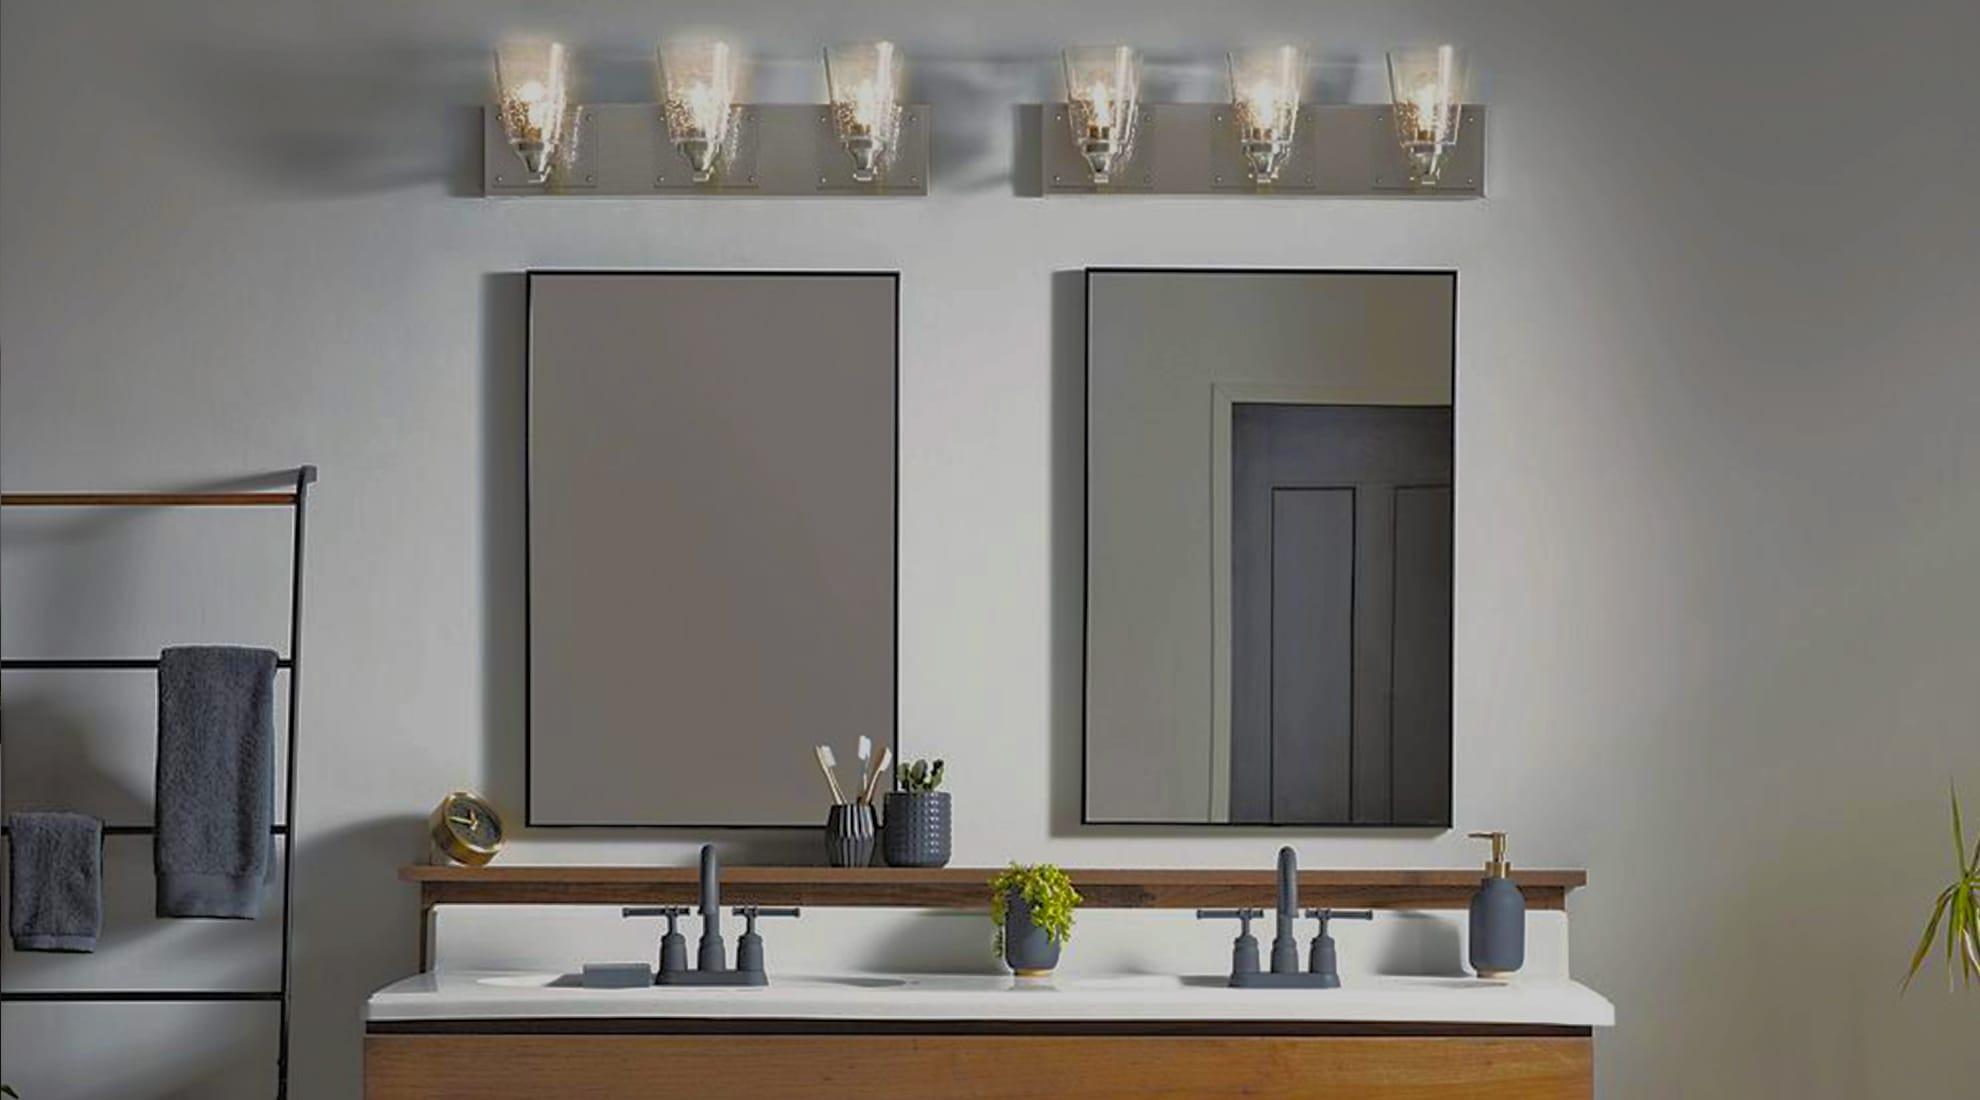 Bathroom Vanity Lighting Buyer's Guide